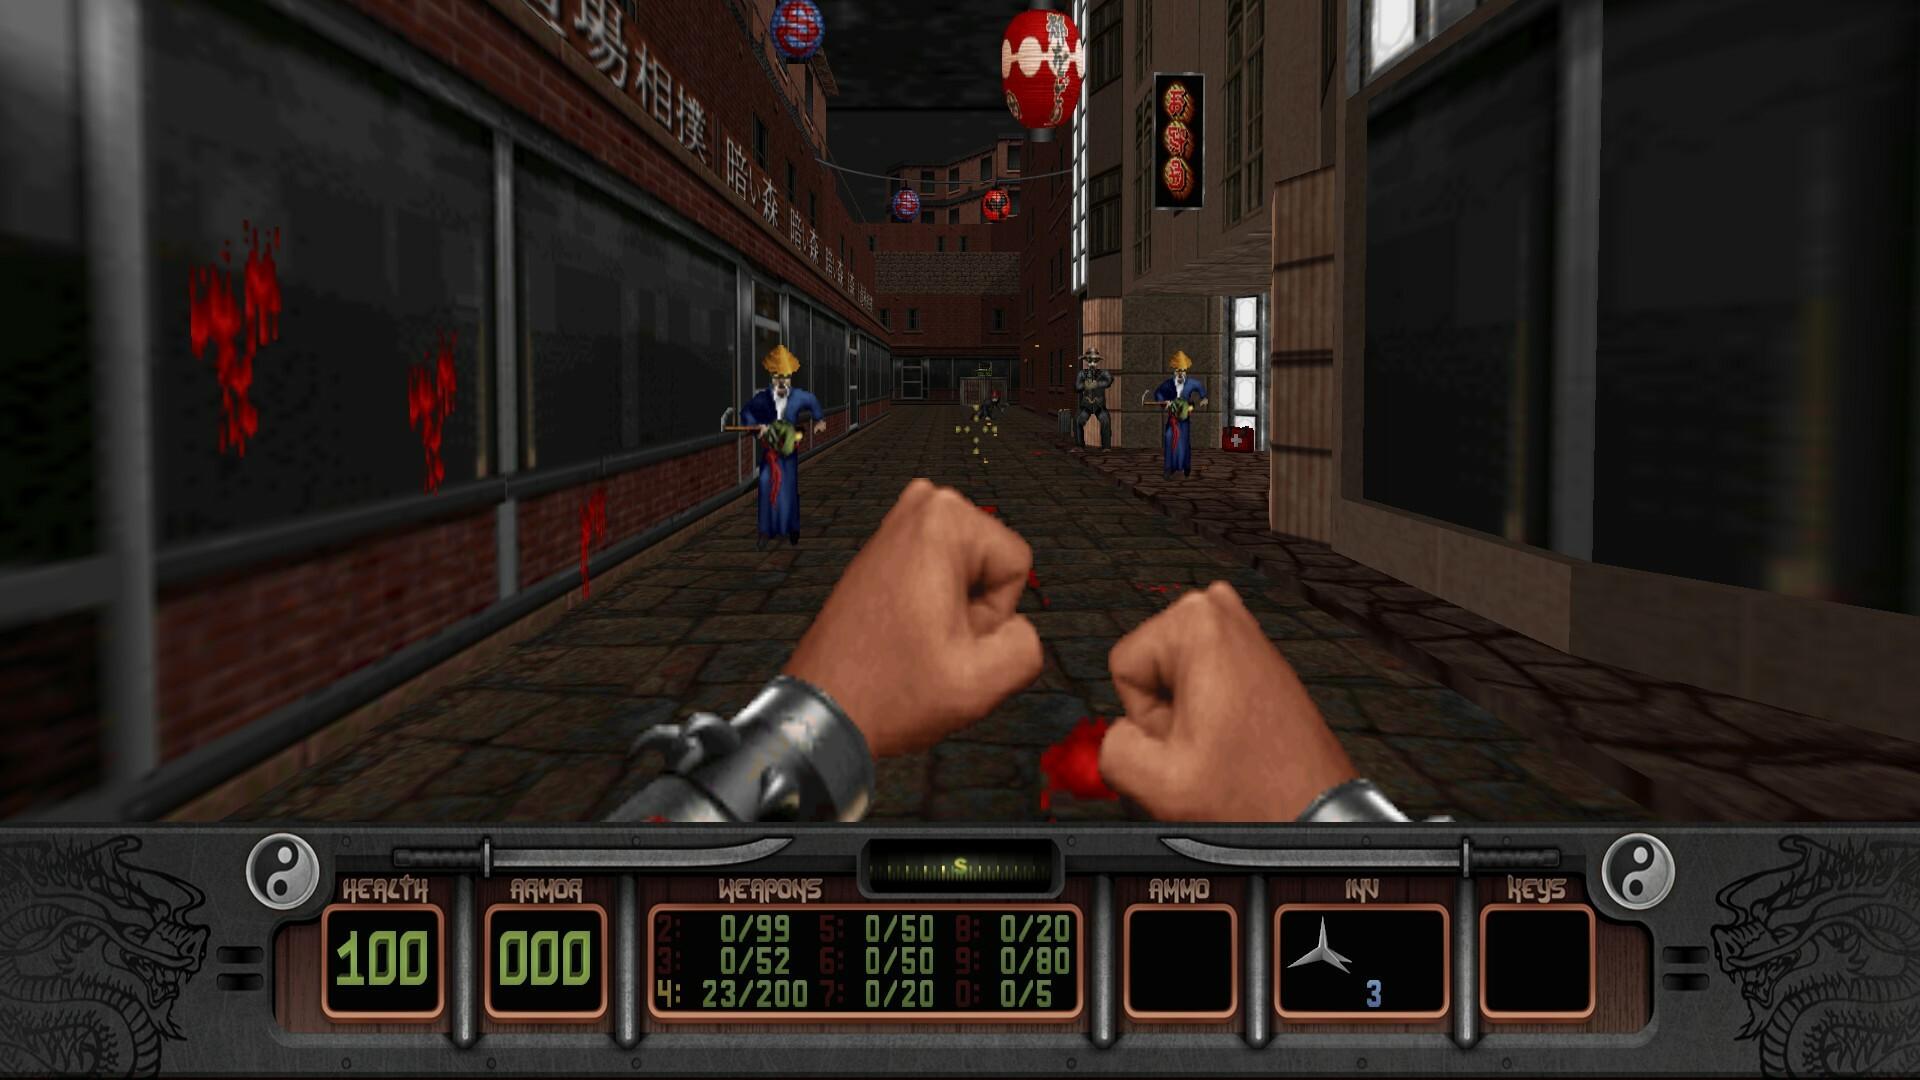 shadow-warrior-classic-redux-pc-screenshot-1